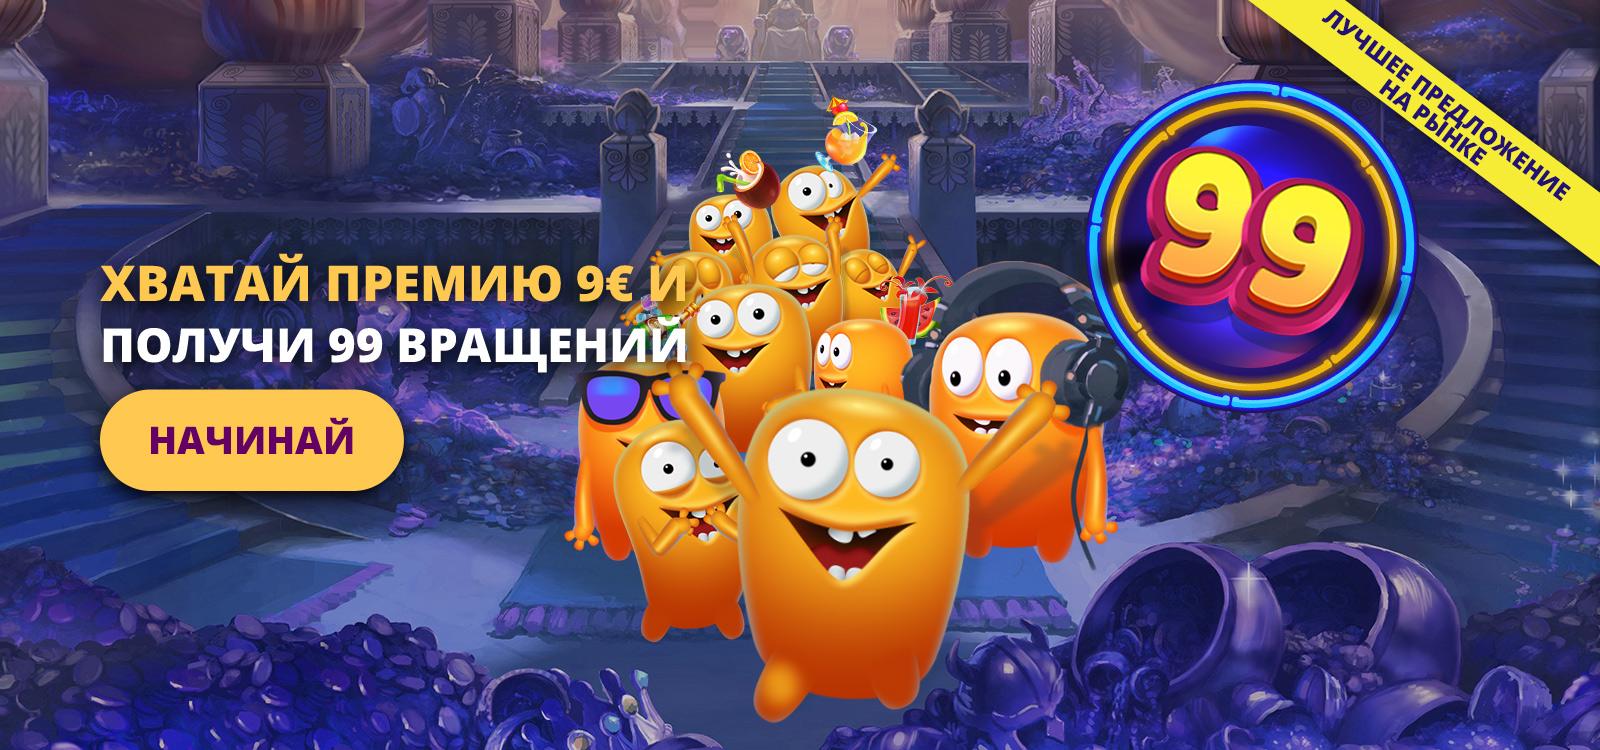 Ru_triple9_kovas_web_1600x750